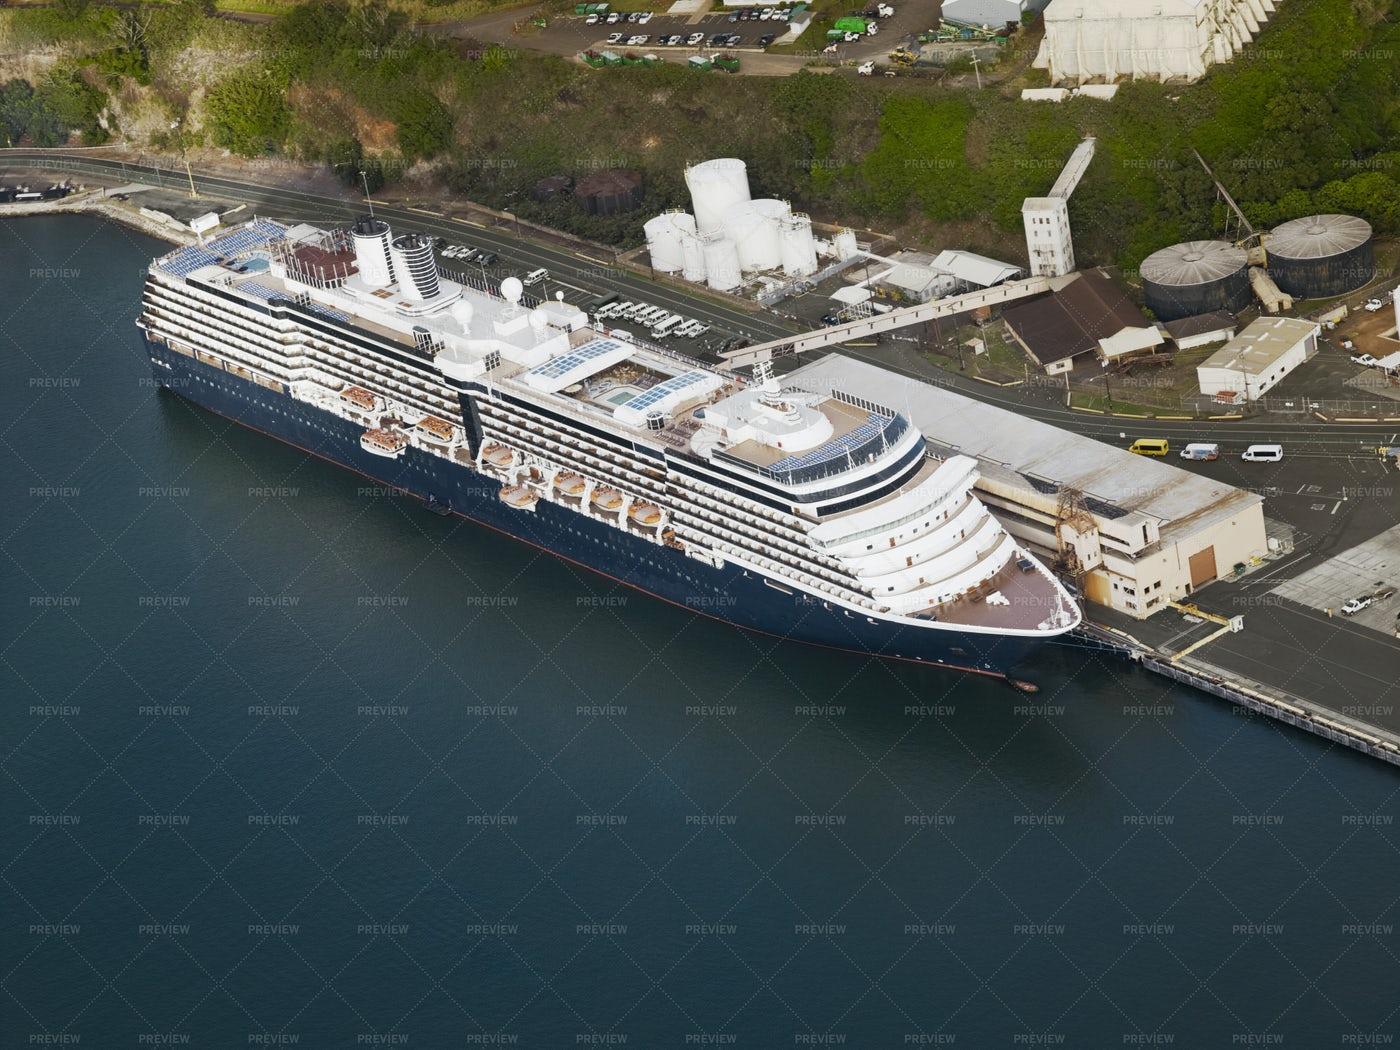 Cruise Ship In Hawaii: Stock Photos